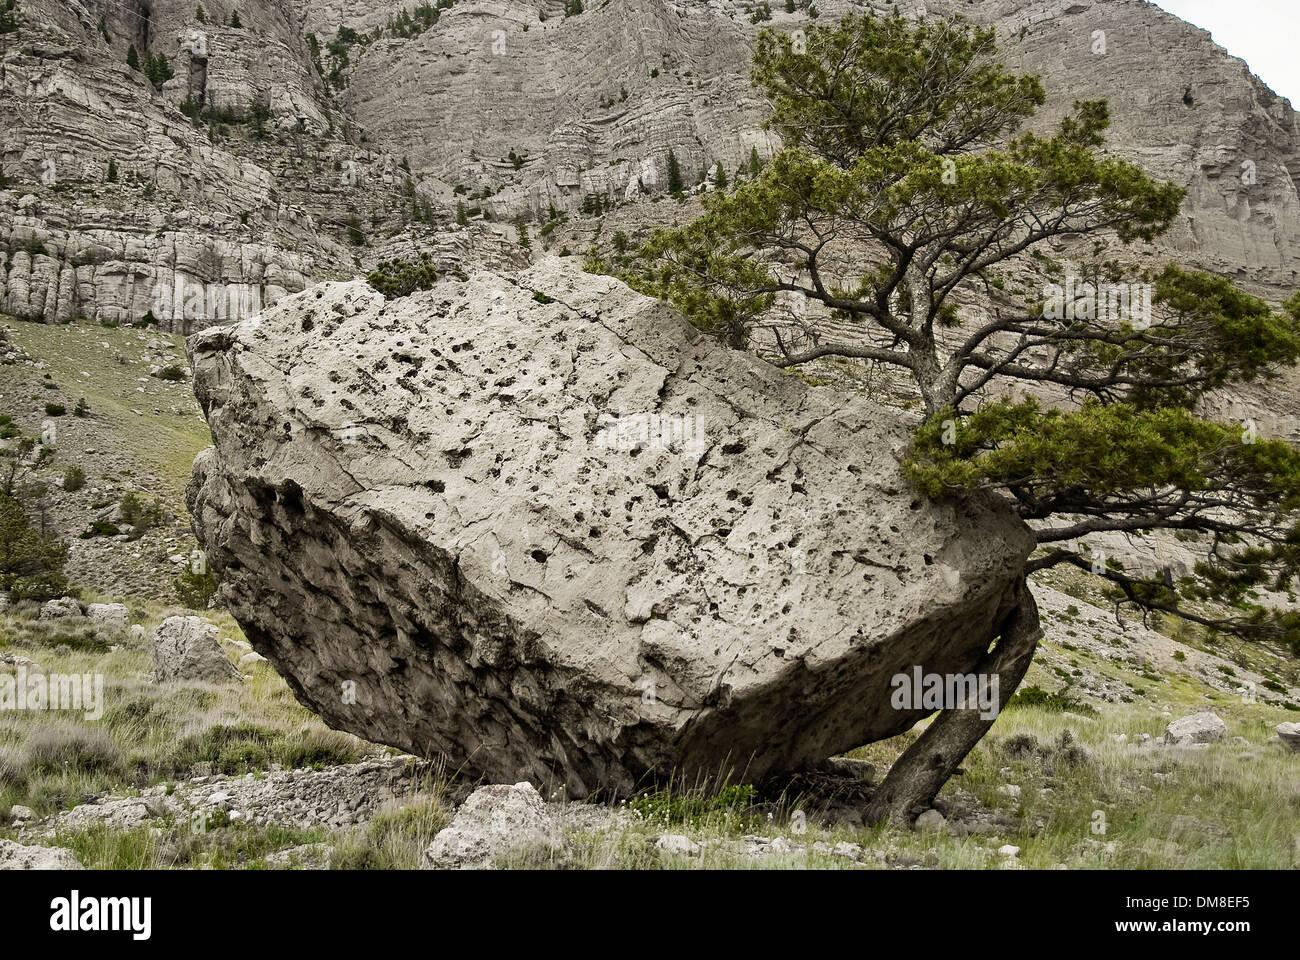 Tree growing around a rock - Stock Image